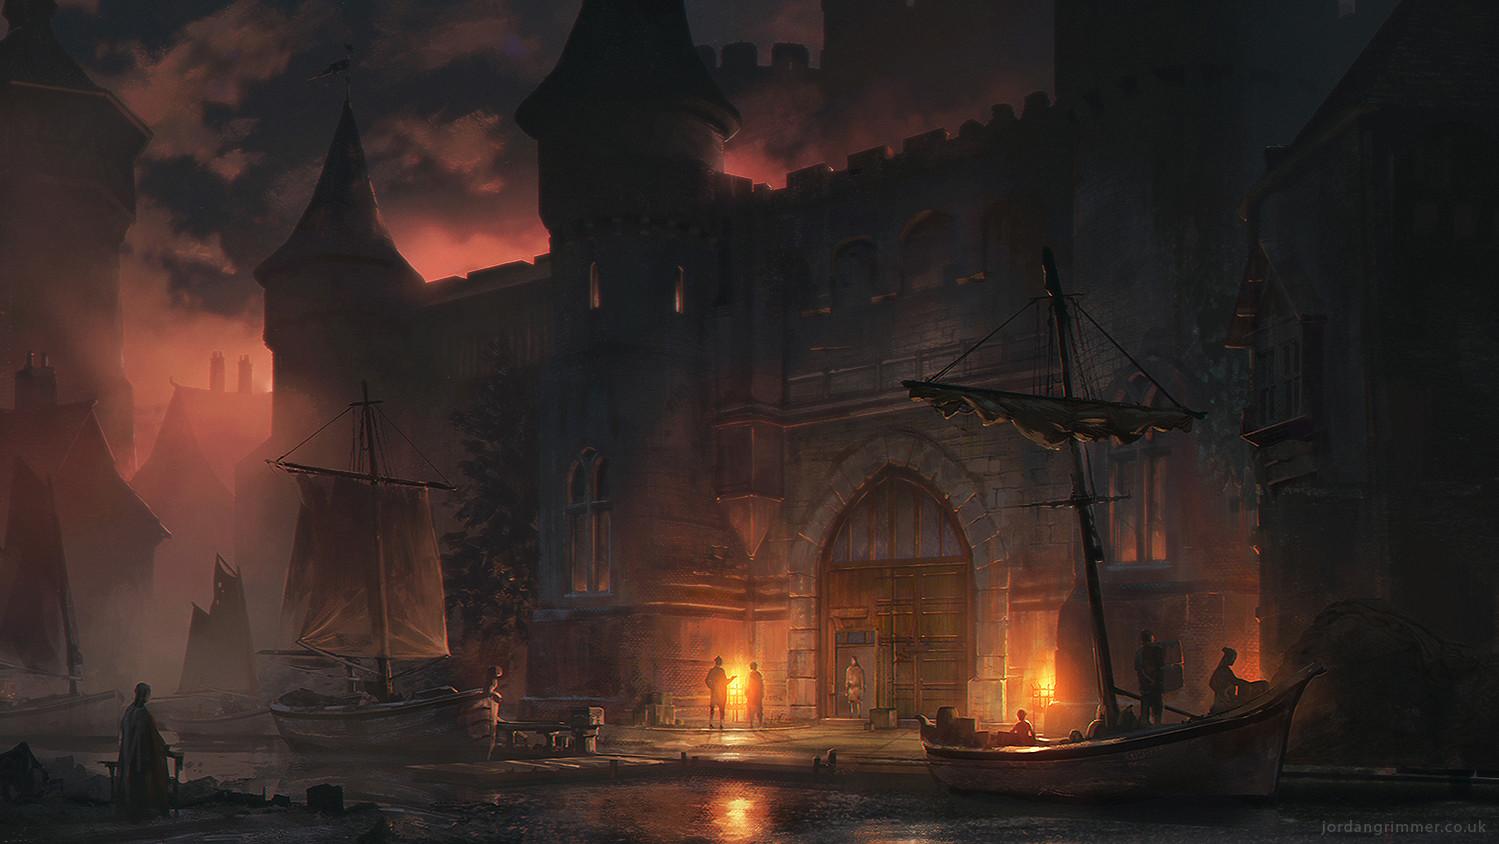 Artstation Dock Jordan Grimmer